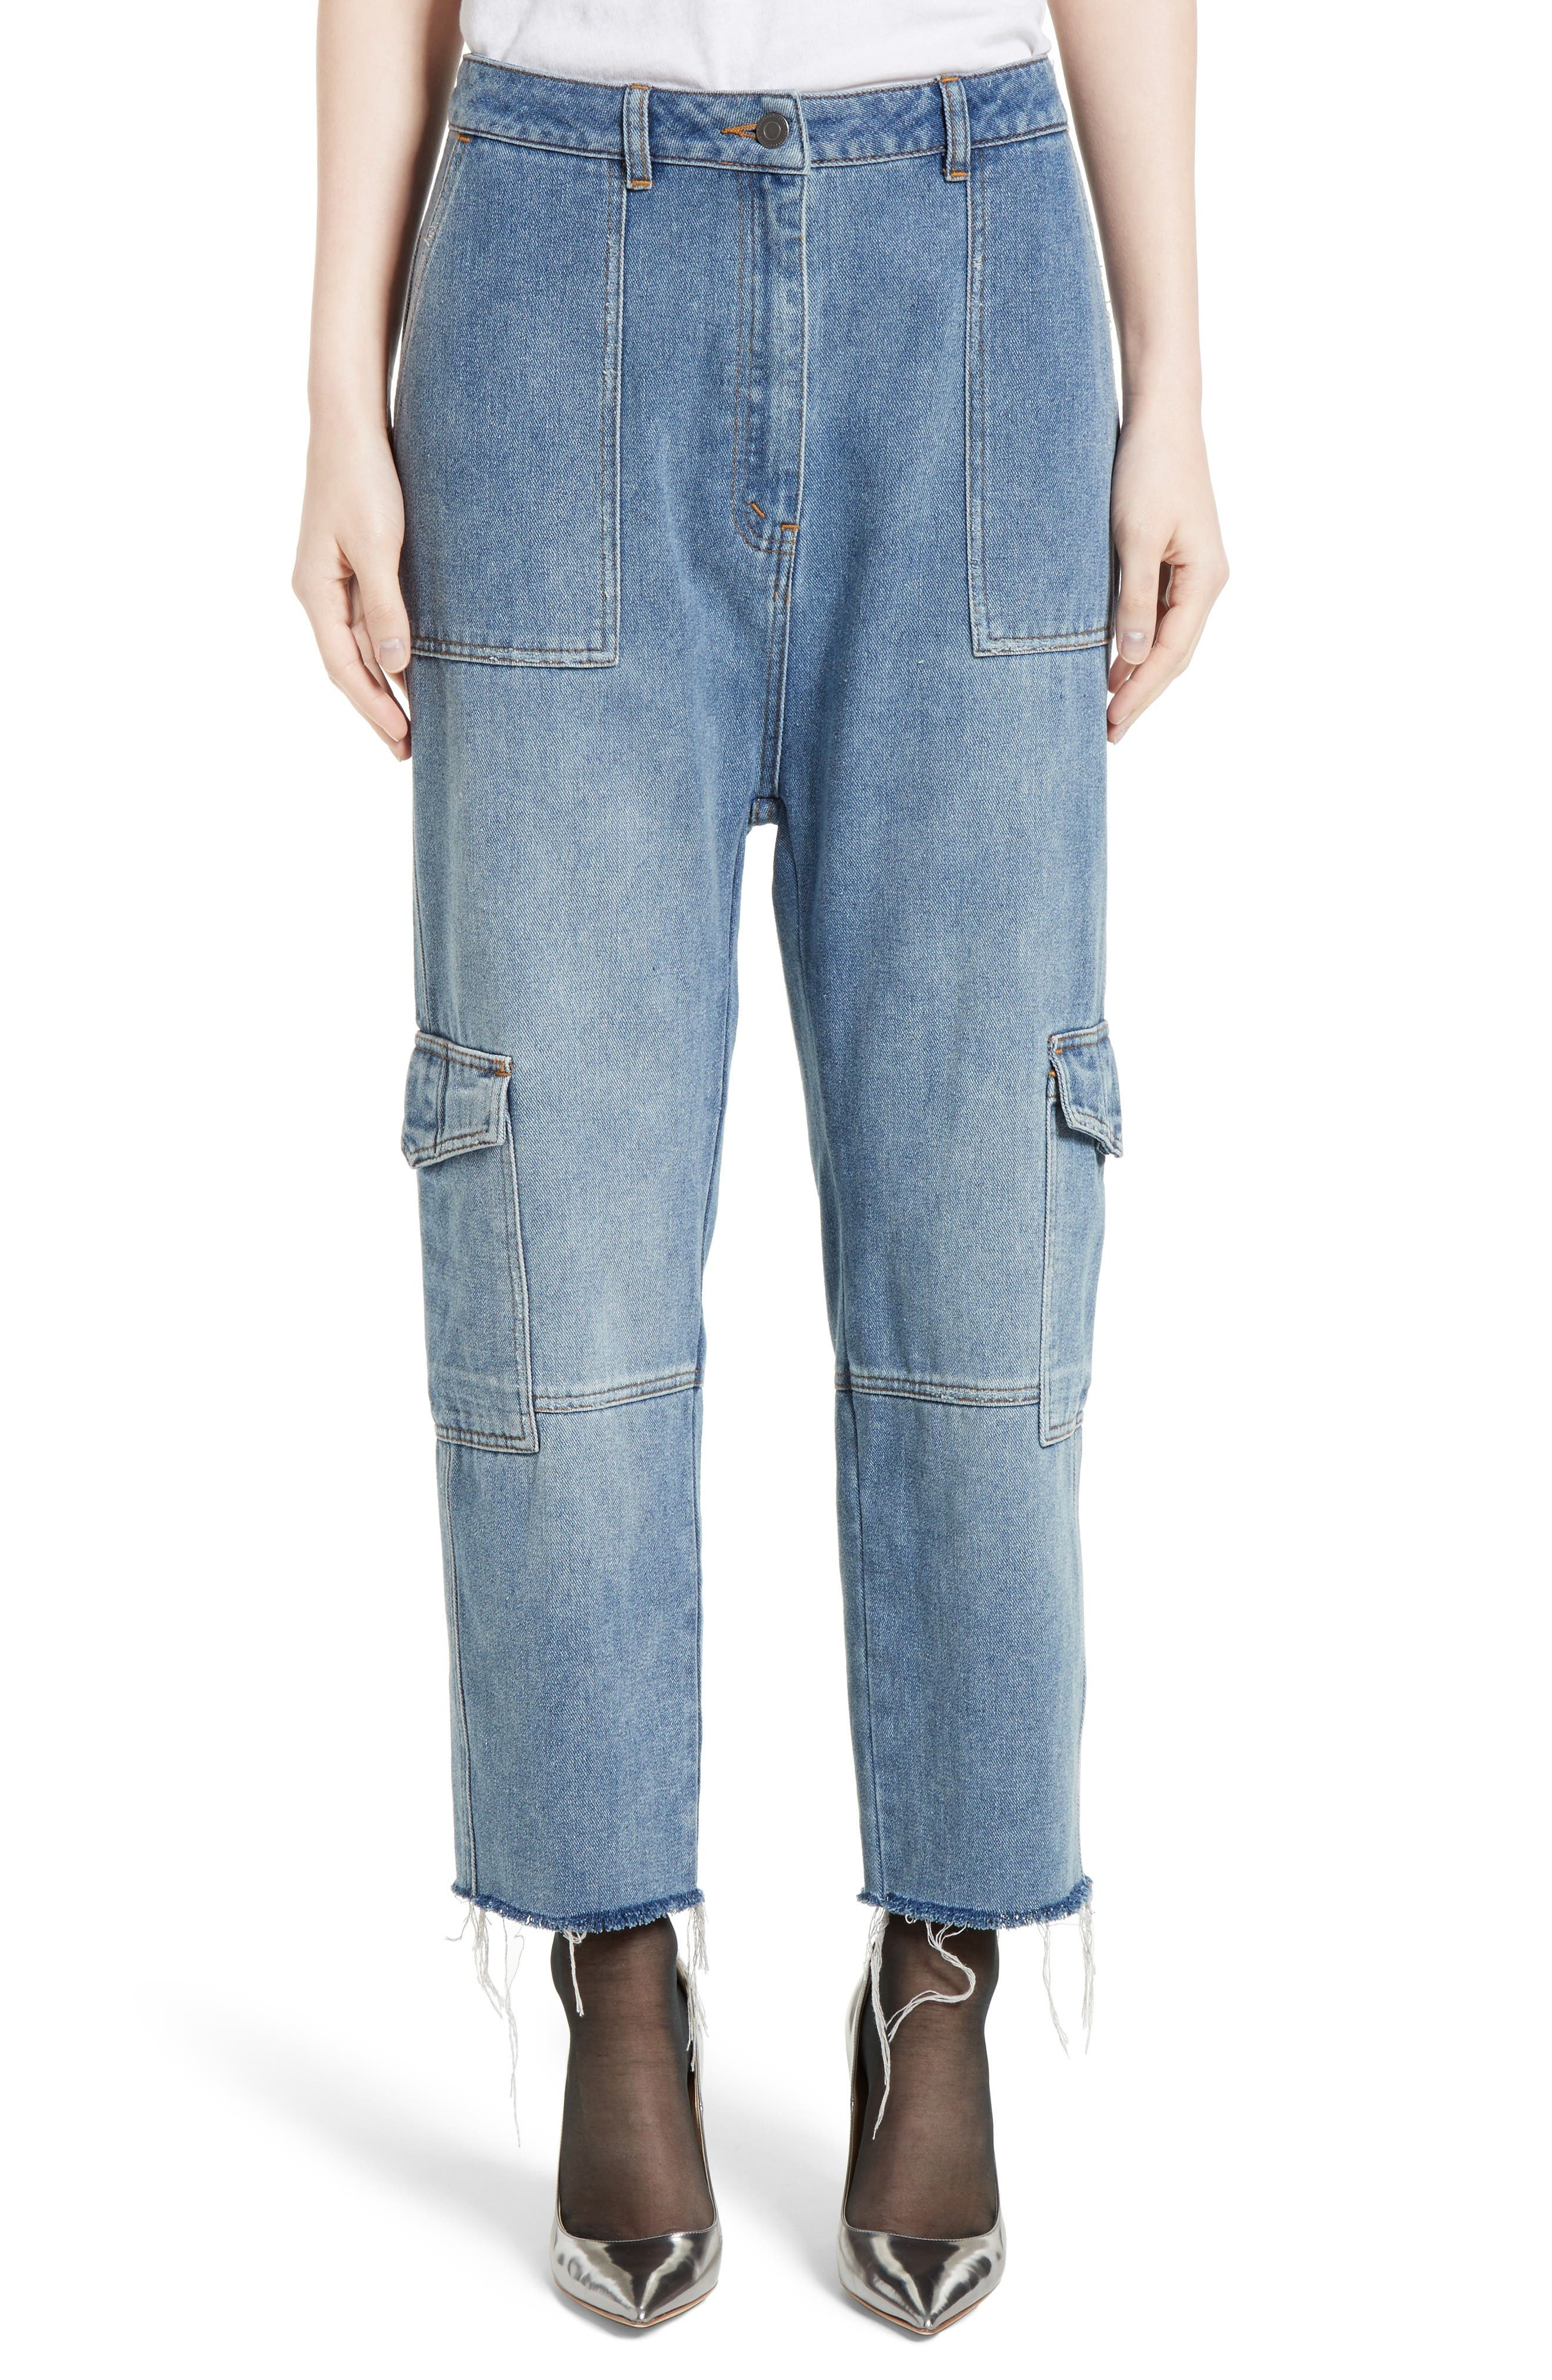 Robert Rodriguez Crop Drop Crotch Cargo Jeans (Medium Distressed)